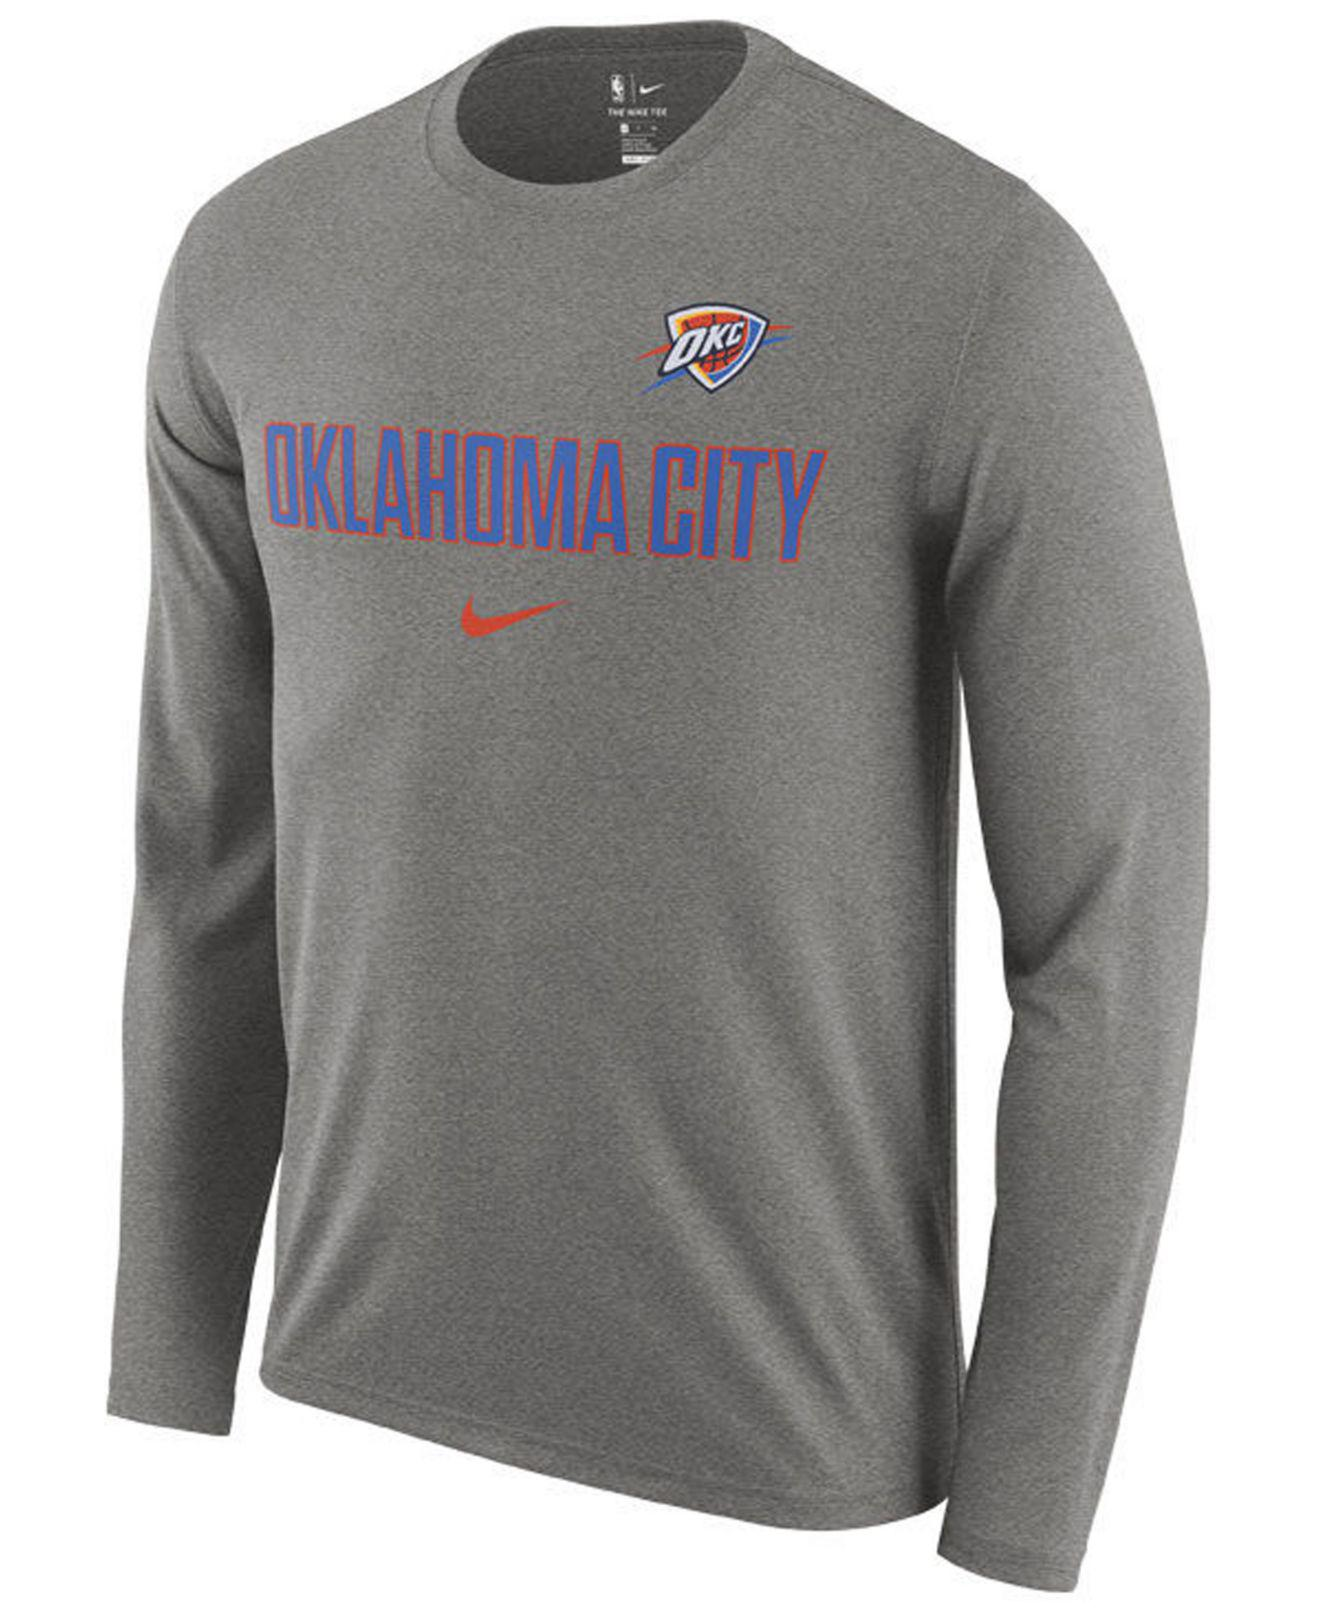 ddb3ad6e Nike. Men's Gray Oklahoma City Thunder Essential Facility Long Sleeve T- shirt